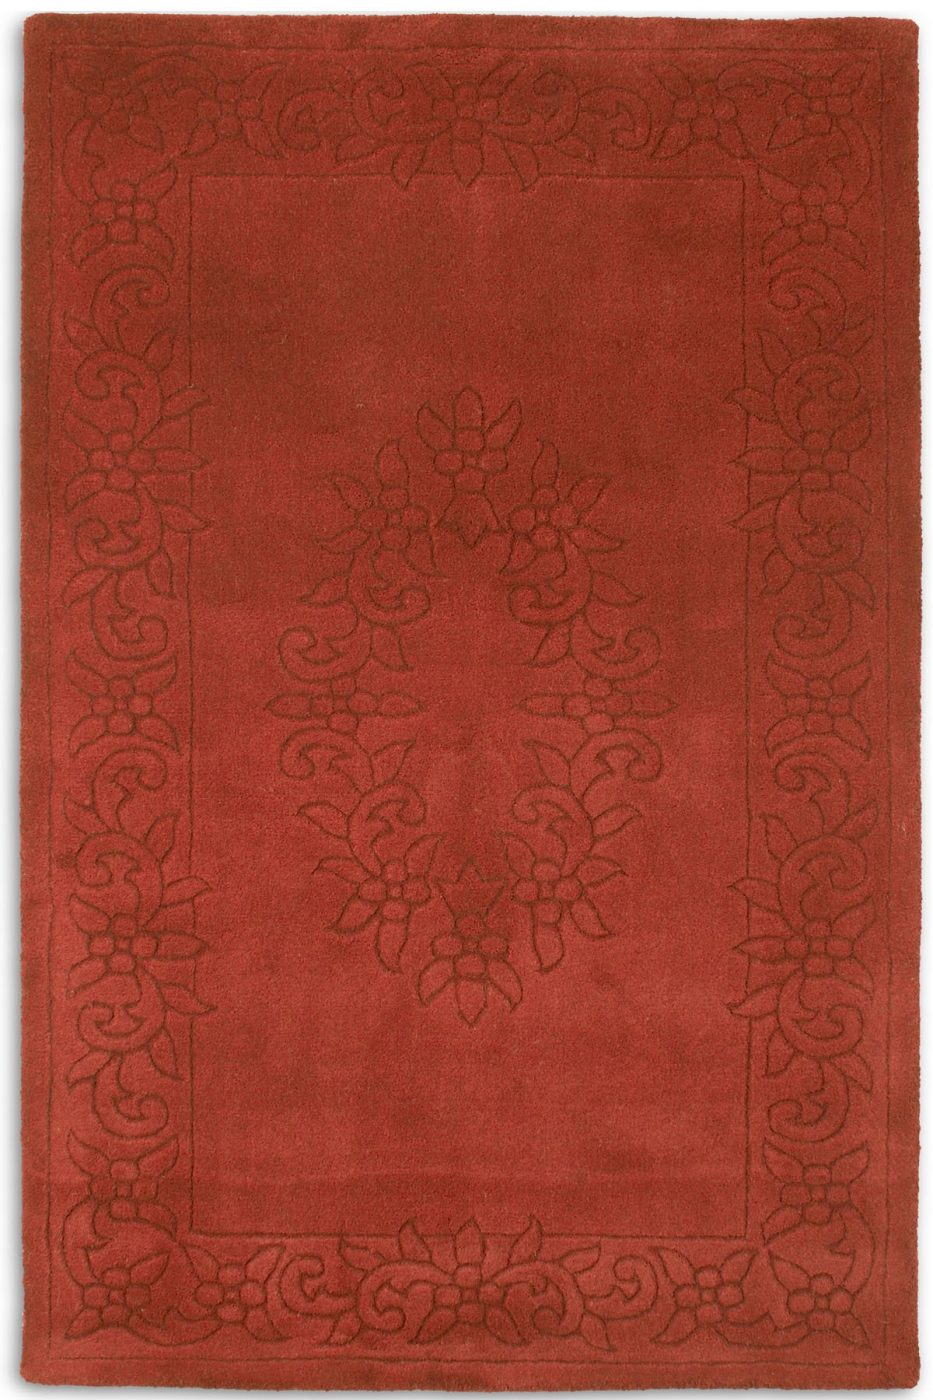 Royale ROY03 | Plantation Rug Company | Best at Flooring